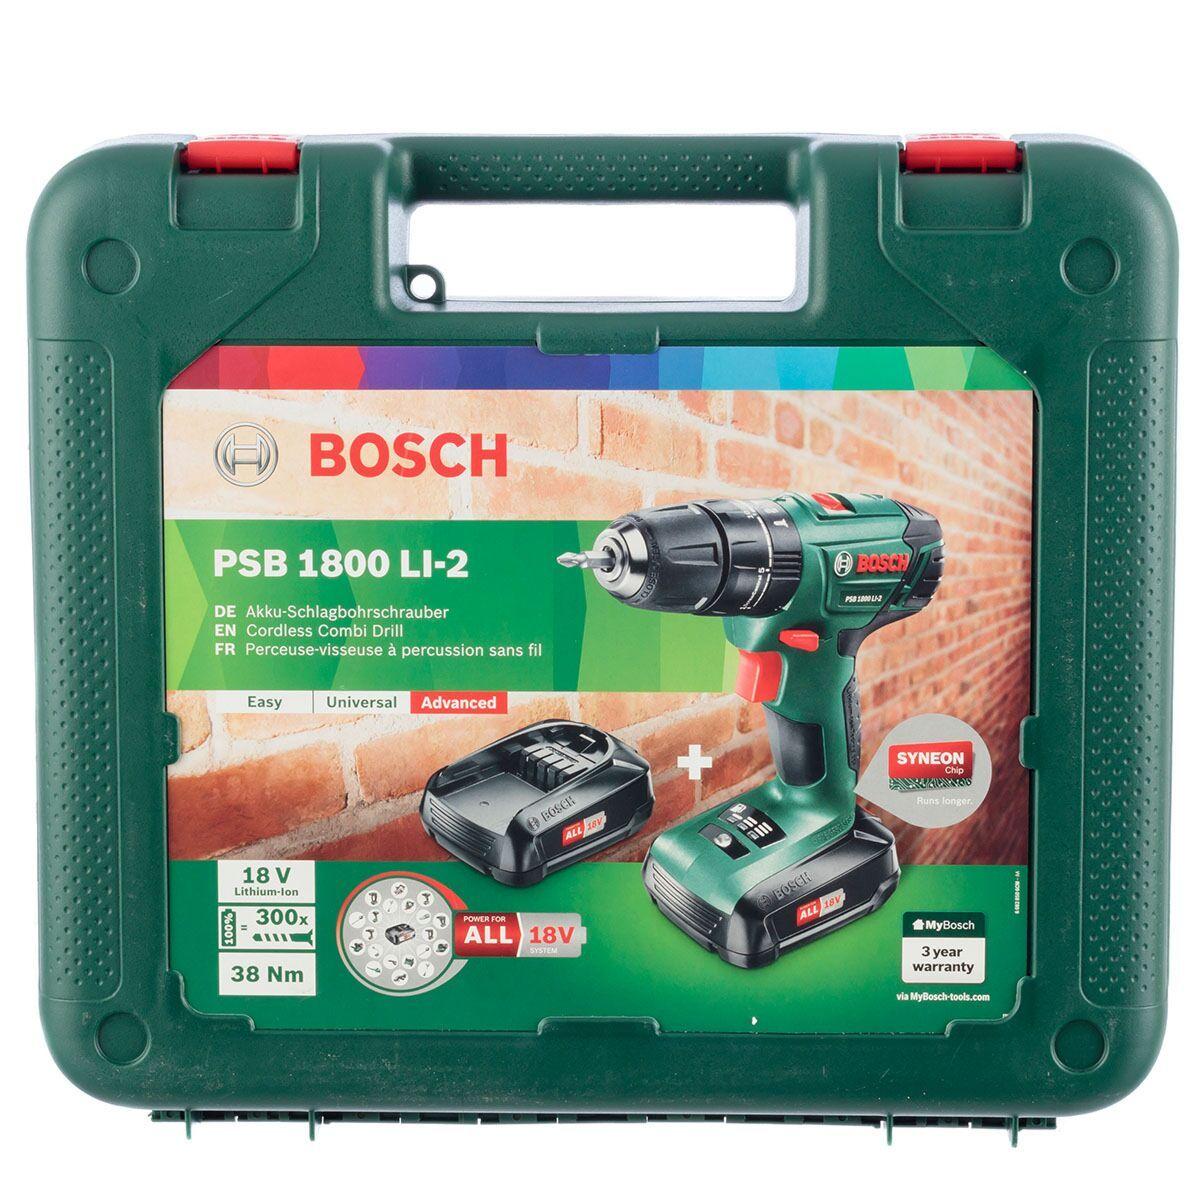 Bosch Psb Li 2 1800 18v Cordless Drill With Spare Battery Case In 2020 18v Cordless Drill Drill Cordless Drill